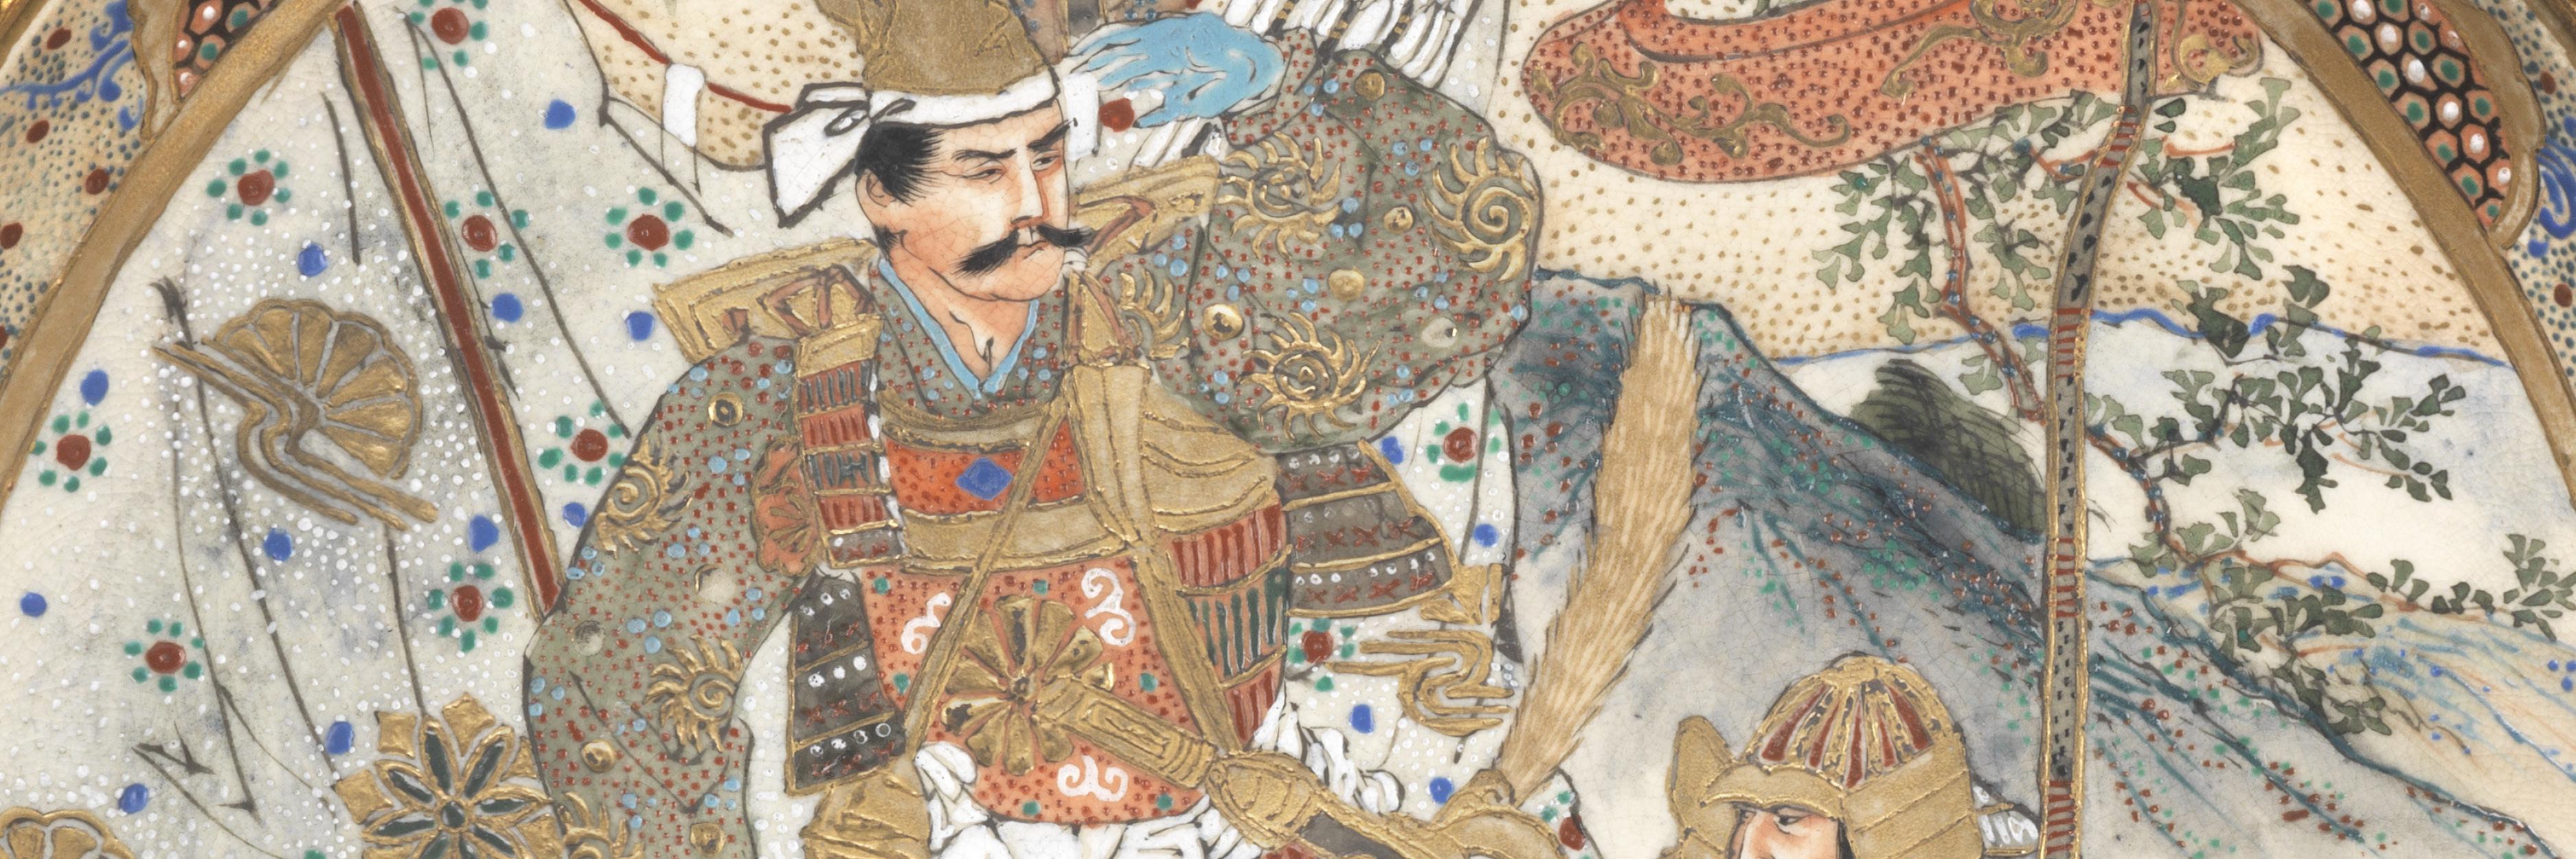 Chrysanthèmes, dragons et samouraïs